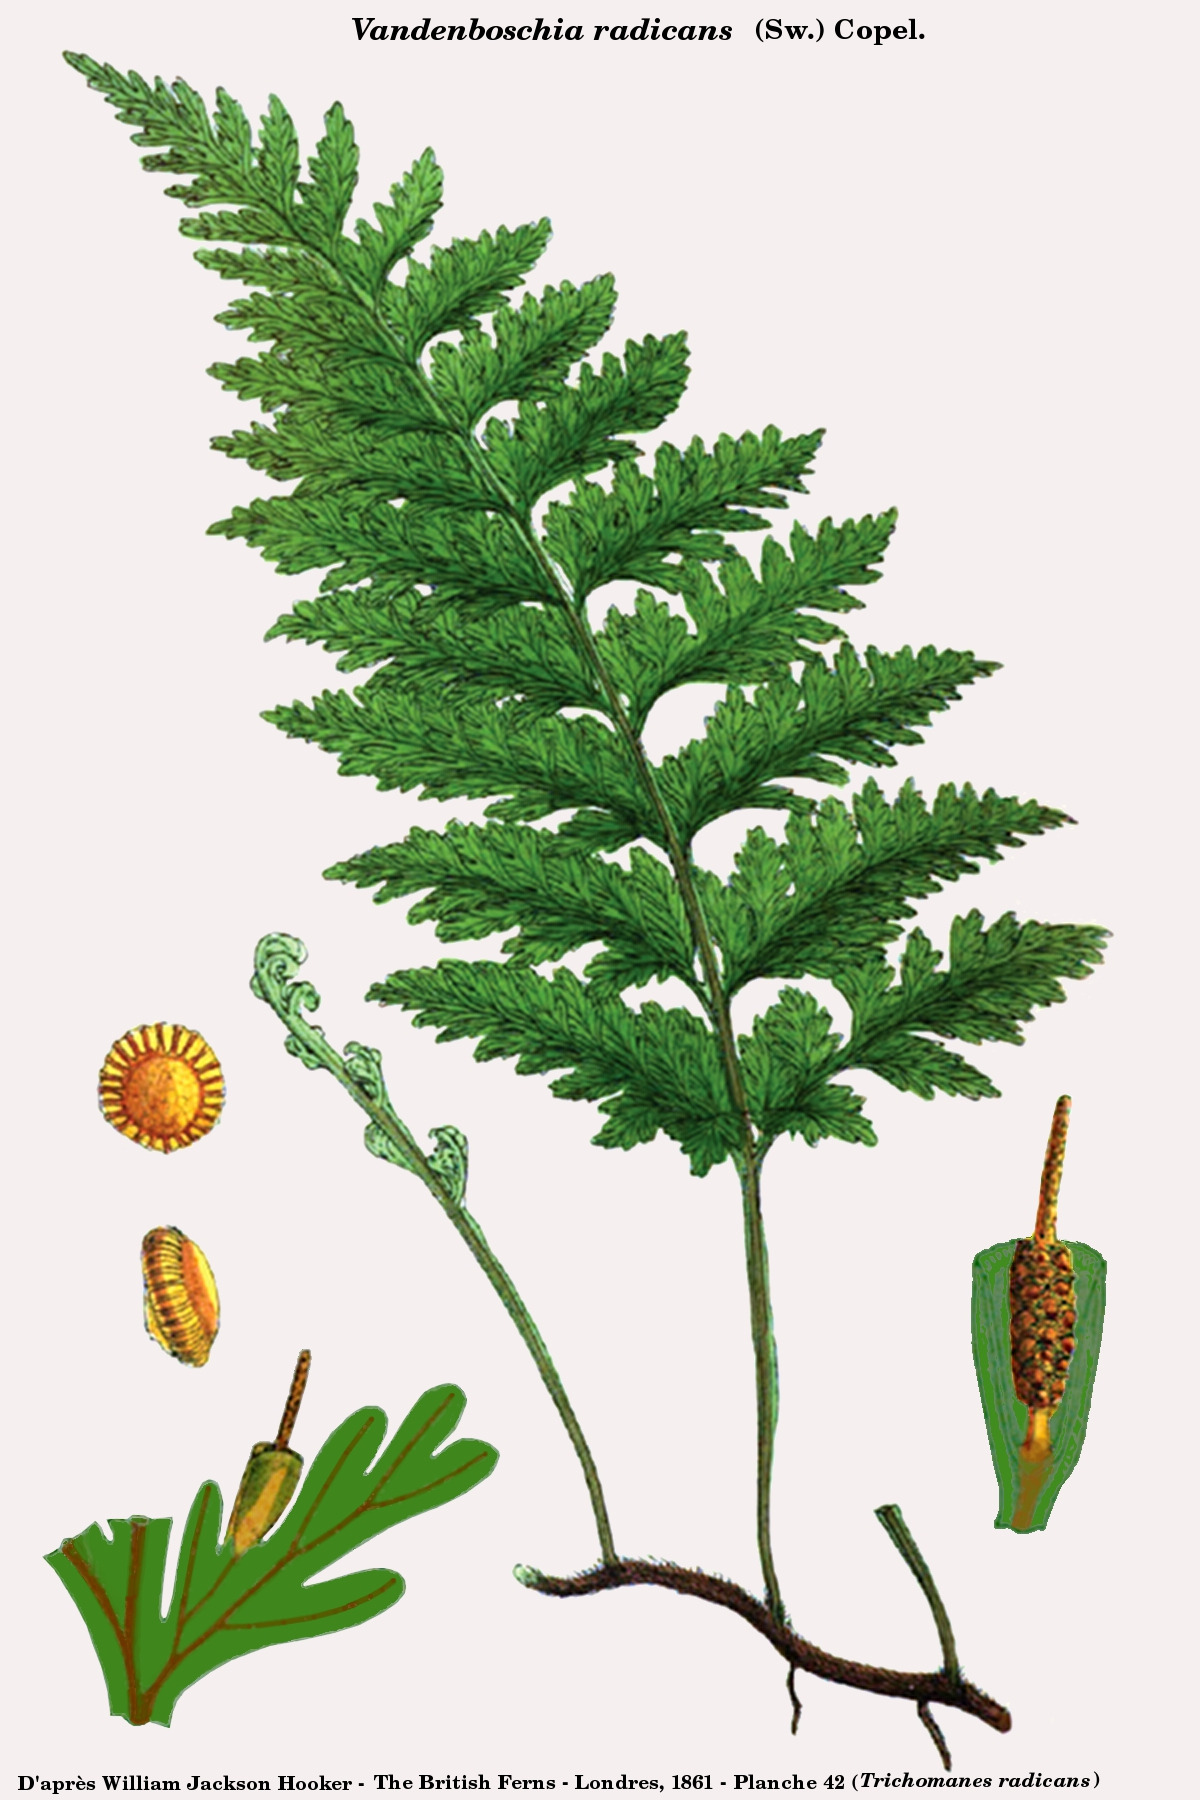 Vandenboschia radicans (Hooker).jpg © Denis.prévôt